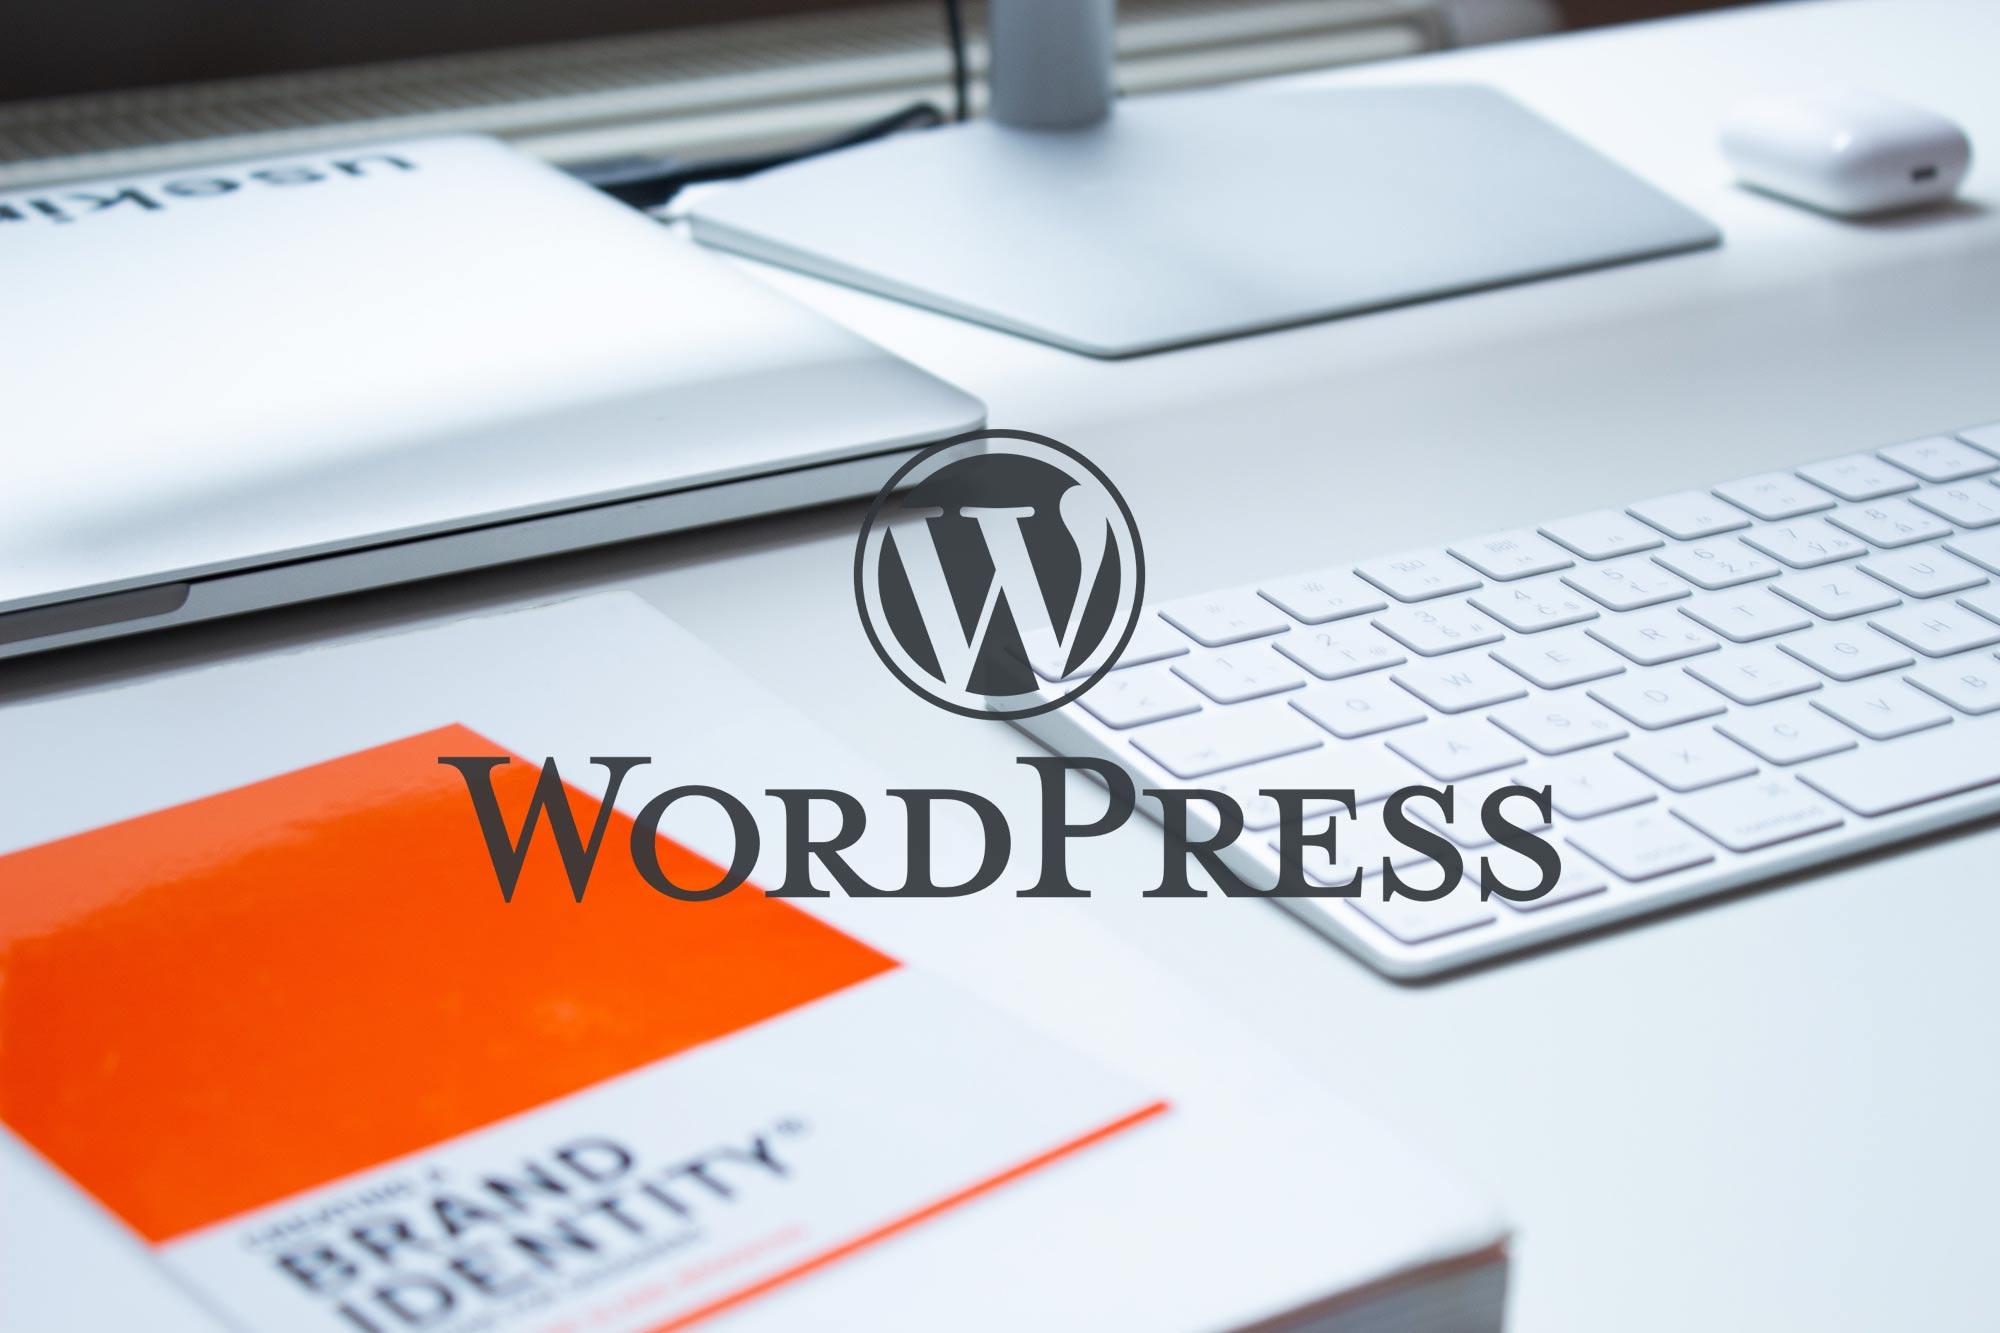 Wordpress是最主流的CMS内容管理网站系统-国际知名事业使用Wordpress建构网站的很多如:TechCrunch, The New Yorker, Beyonce, The Official Star Wars Blog, Microsoft News Center, BBC America, Vogue, Sony Music, Time Megazine, TED Blog, Microsoft News ...等。Wordpress 在CMS网页设计的市场占有率是60%;总网路网站占有率33 (2019W3Techs),统计数字说明...台北网页设计公司推荐-2.5D品牌顾问(品牌网站建置设计费用、收费、报价单洽询)提供:SEO关键字优化、RWD响应式网页设计、公司品牌网页设计、公司形象网站制作、网路开店、购物网站设计、网页设计作品集、ㄧ页式网页、网页设计步骤、网页设计范例、科技公司网页设计、设计公司网页设计、官网设计、餐厅网页设计、工作室网页设计、学校网页设计、贸易网页设计、外销网页设计、研究中心网页设计、大学网页设计、系所网页设计、艺廊网页设计。客户触及桃园,新竹,台中,台南,高雄与北台湾-欢迎您联系。